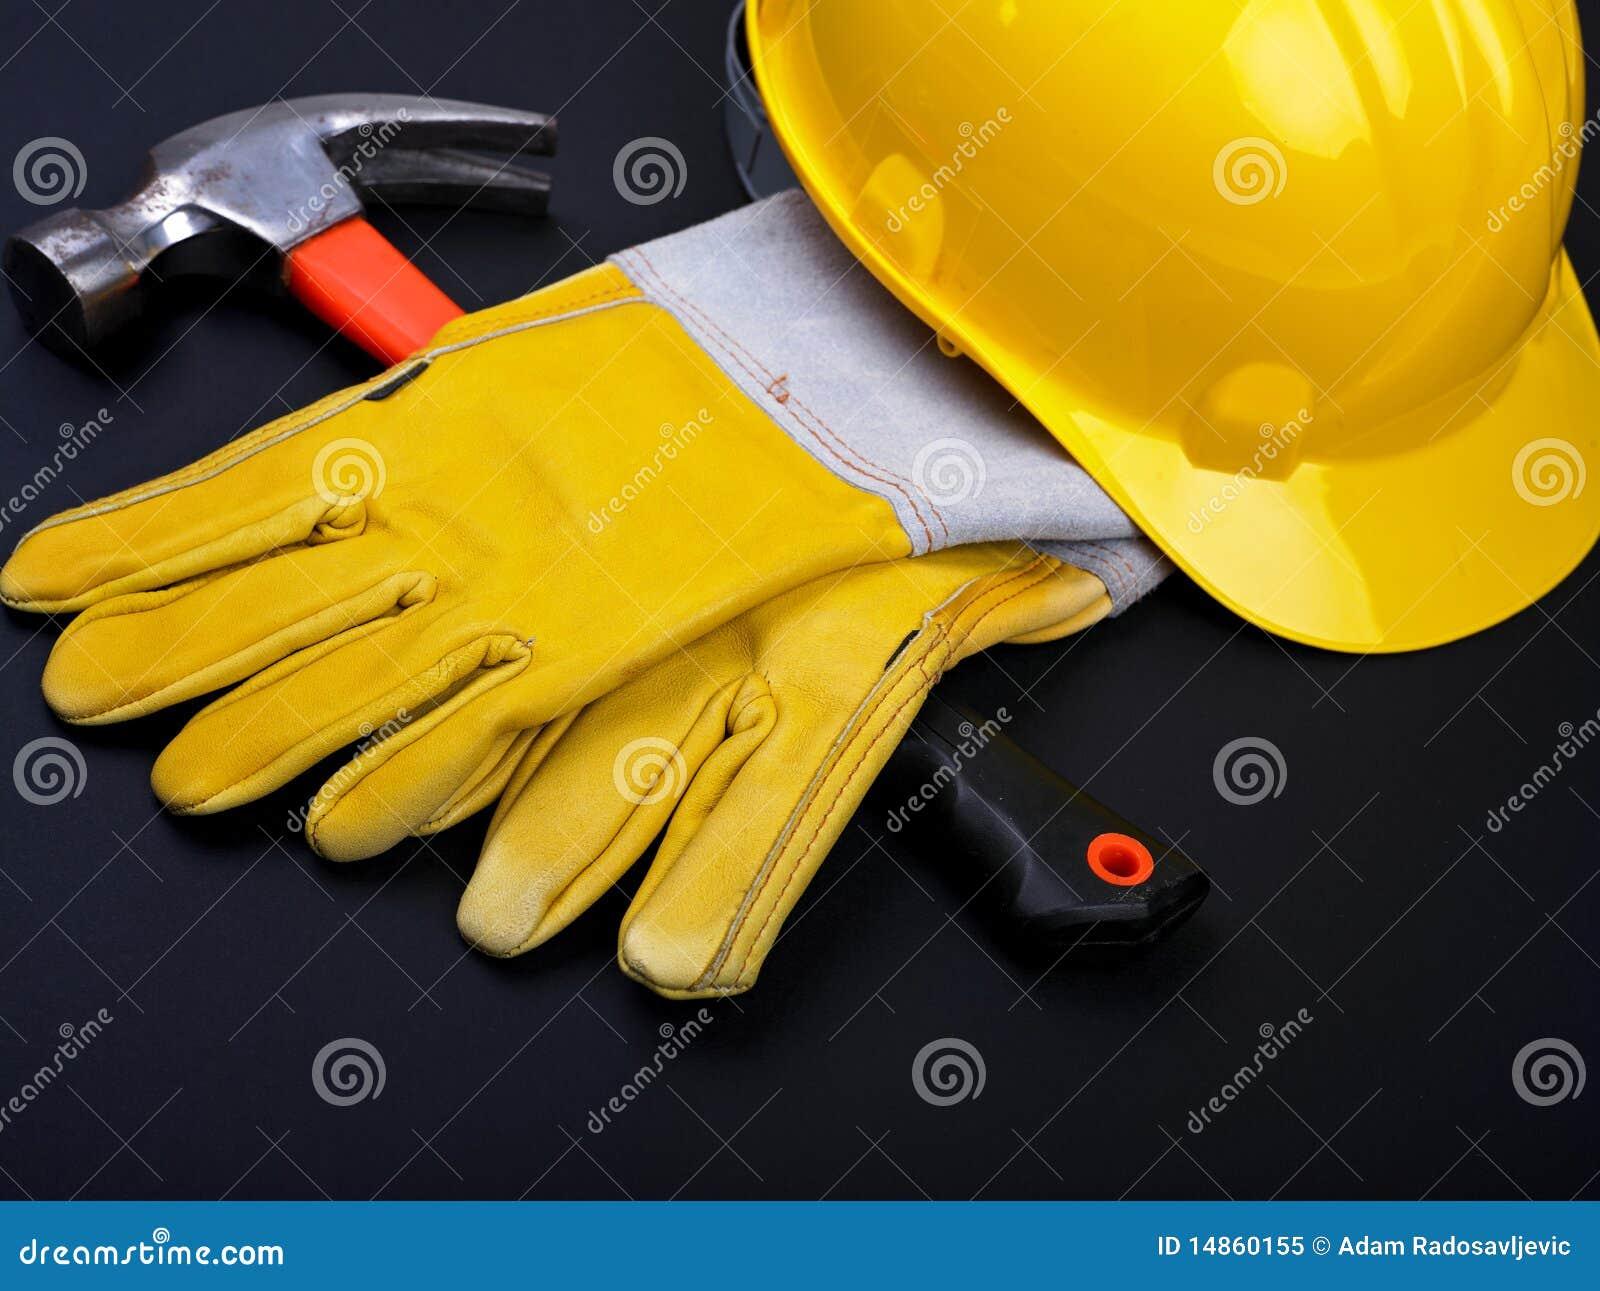 HardHat Hammer And Gloves